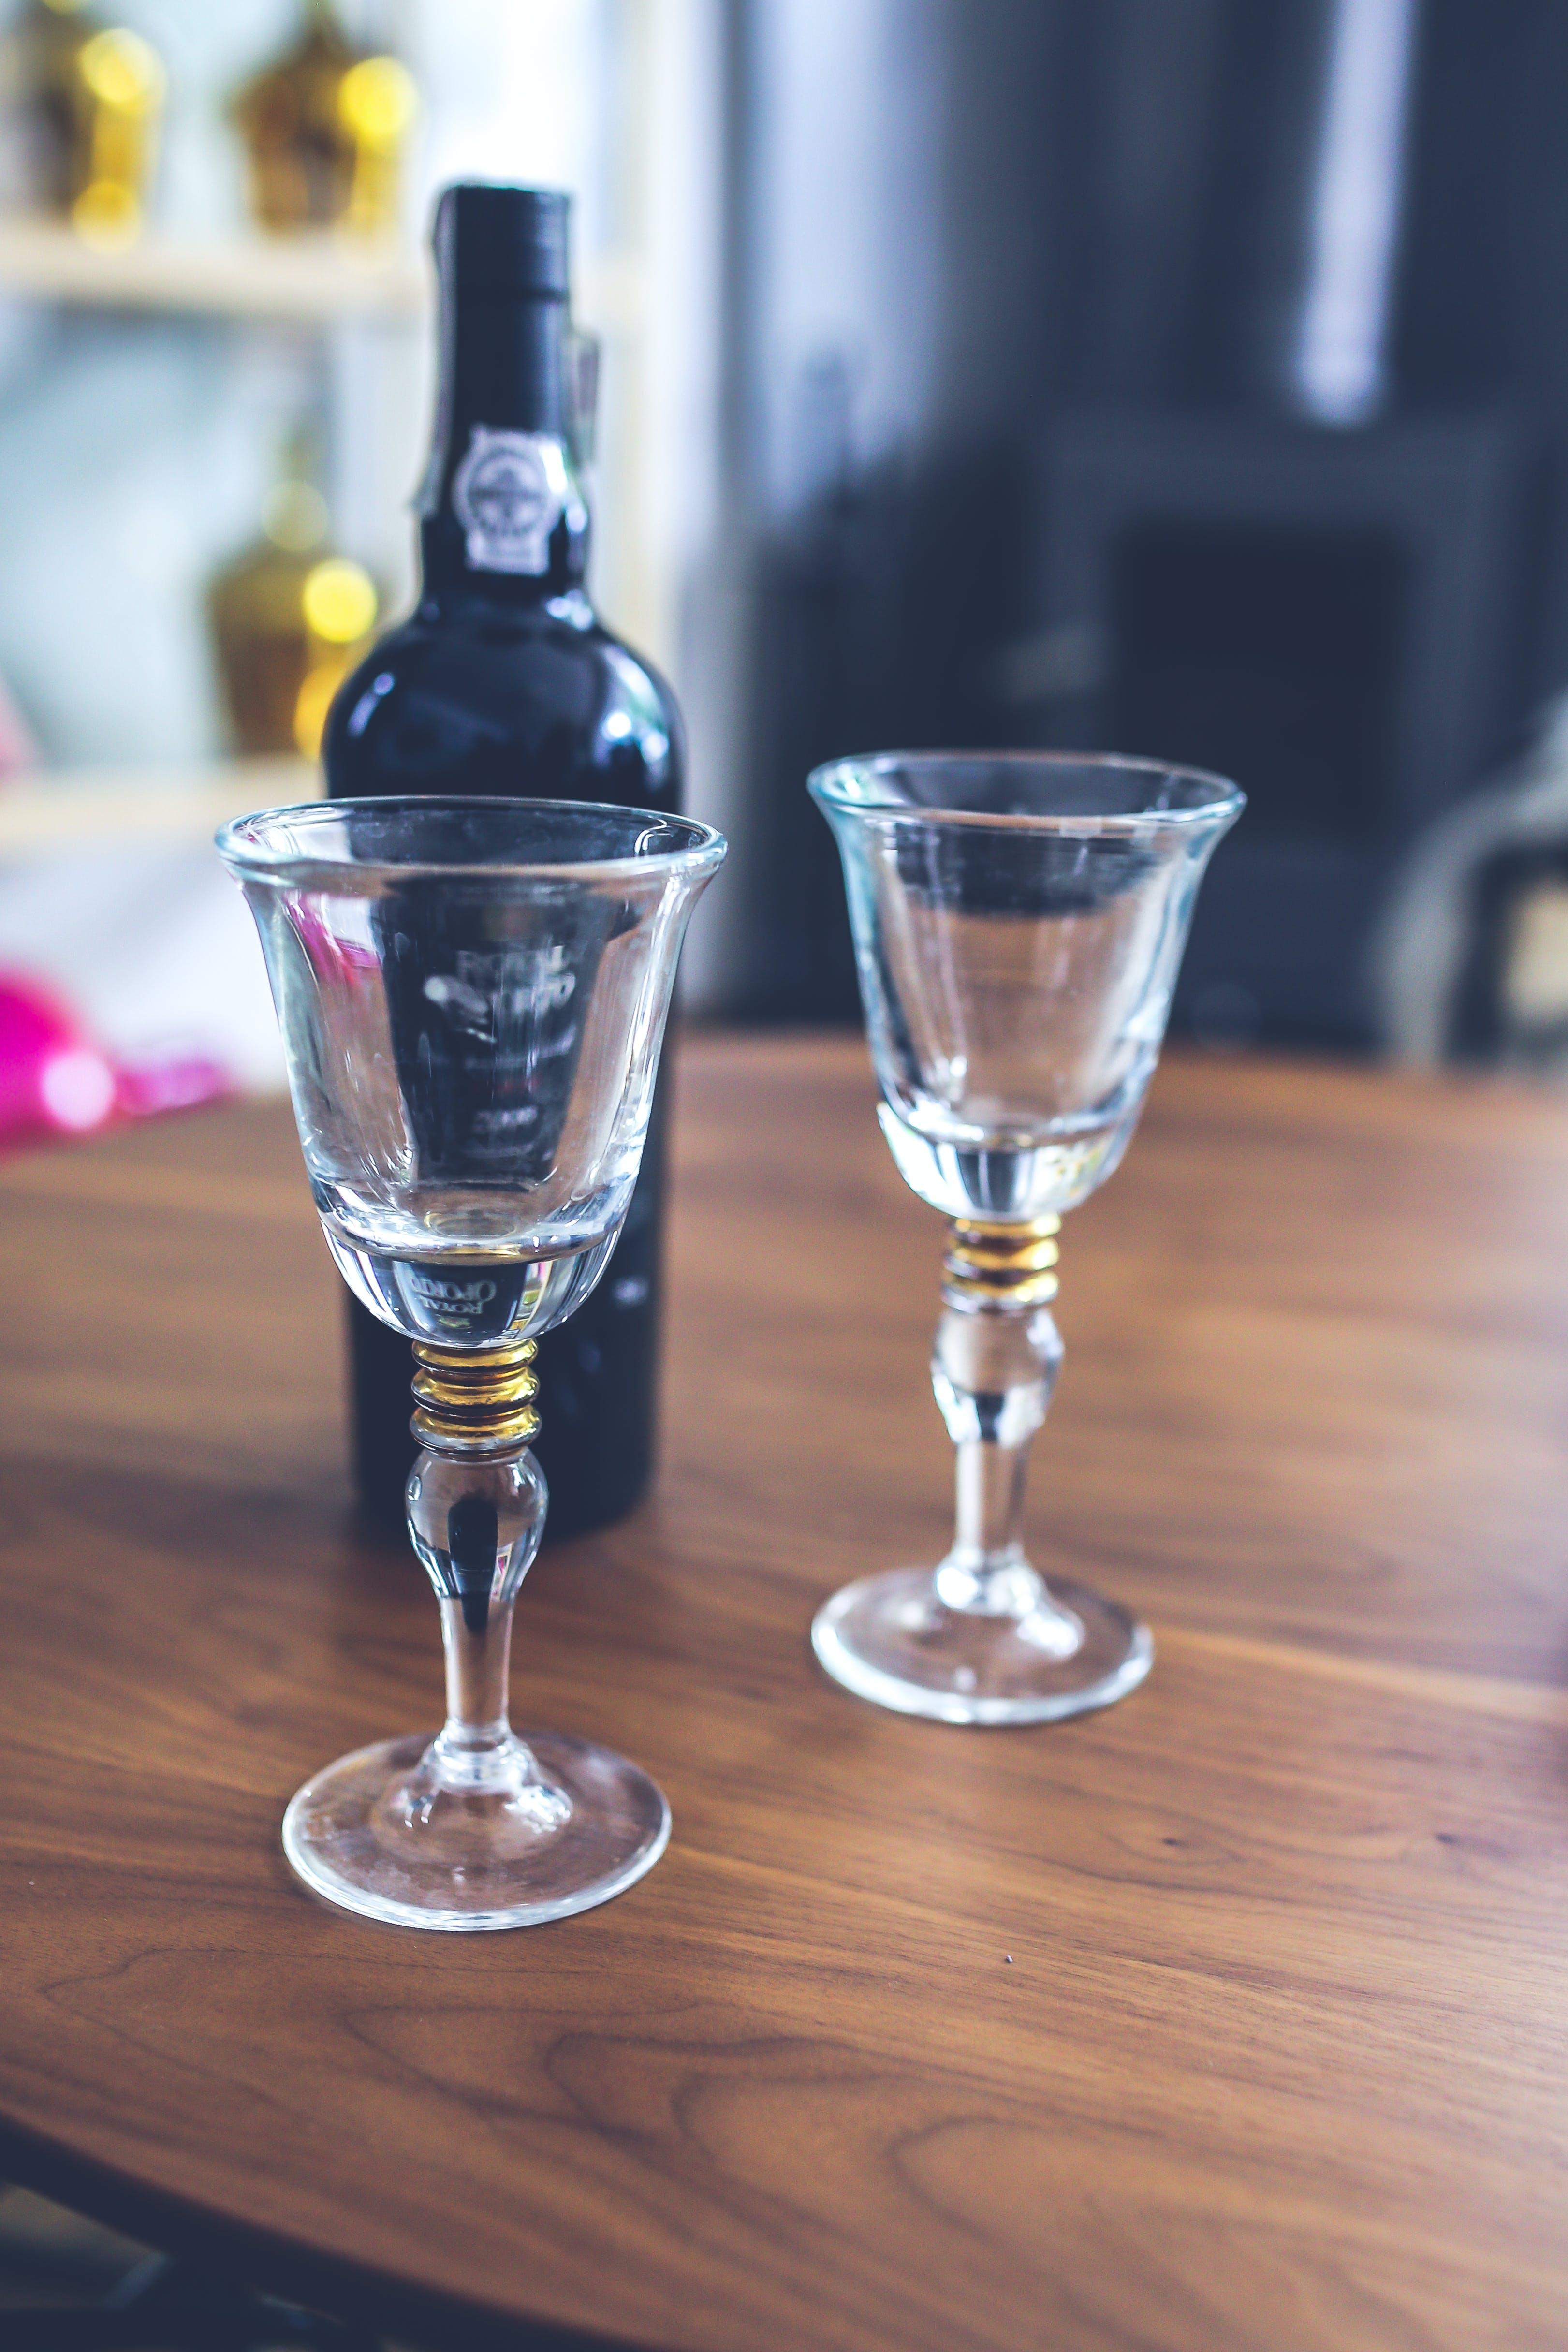 Two wine glasses & bottle